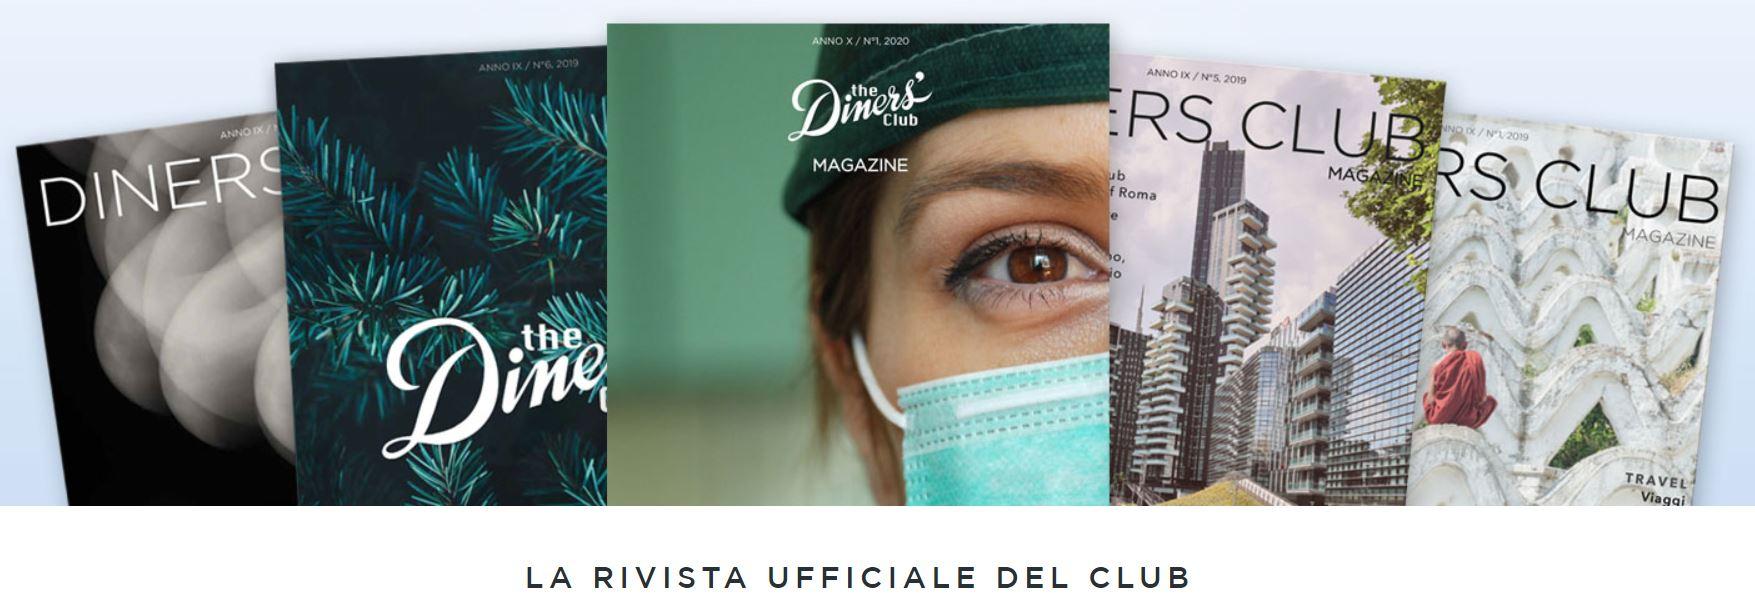 magazine diners club